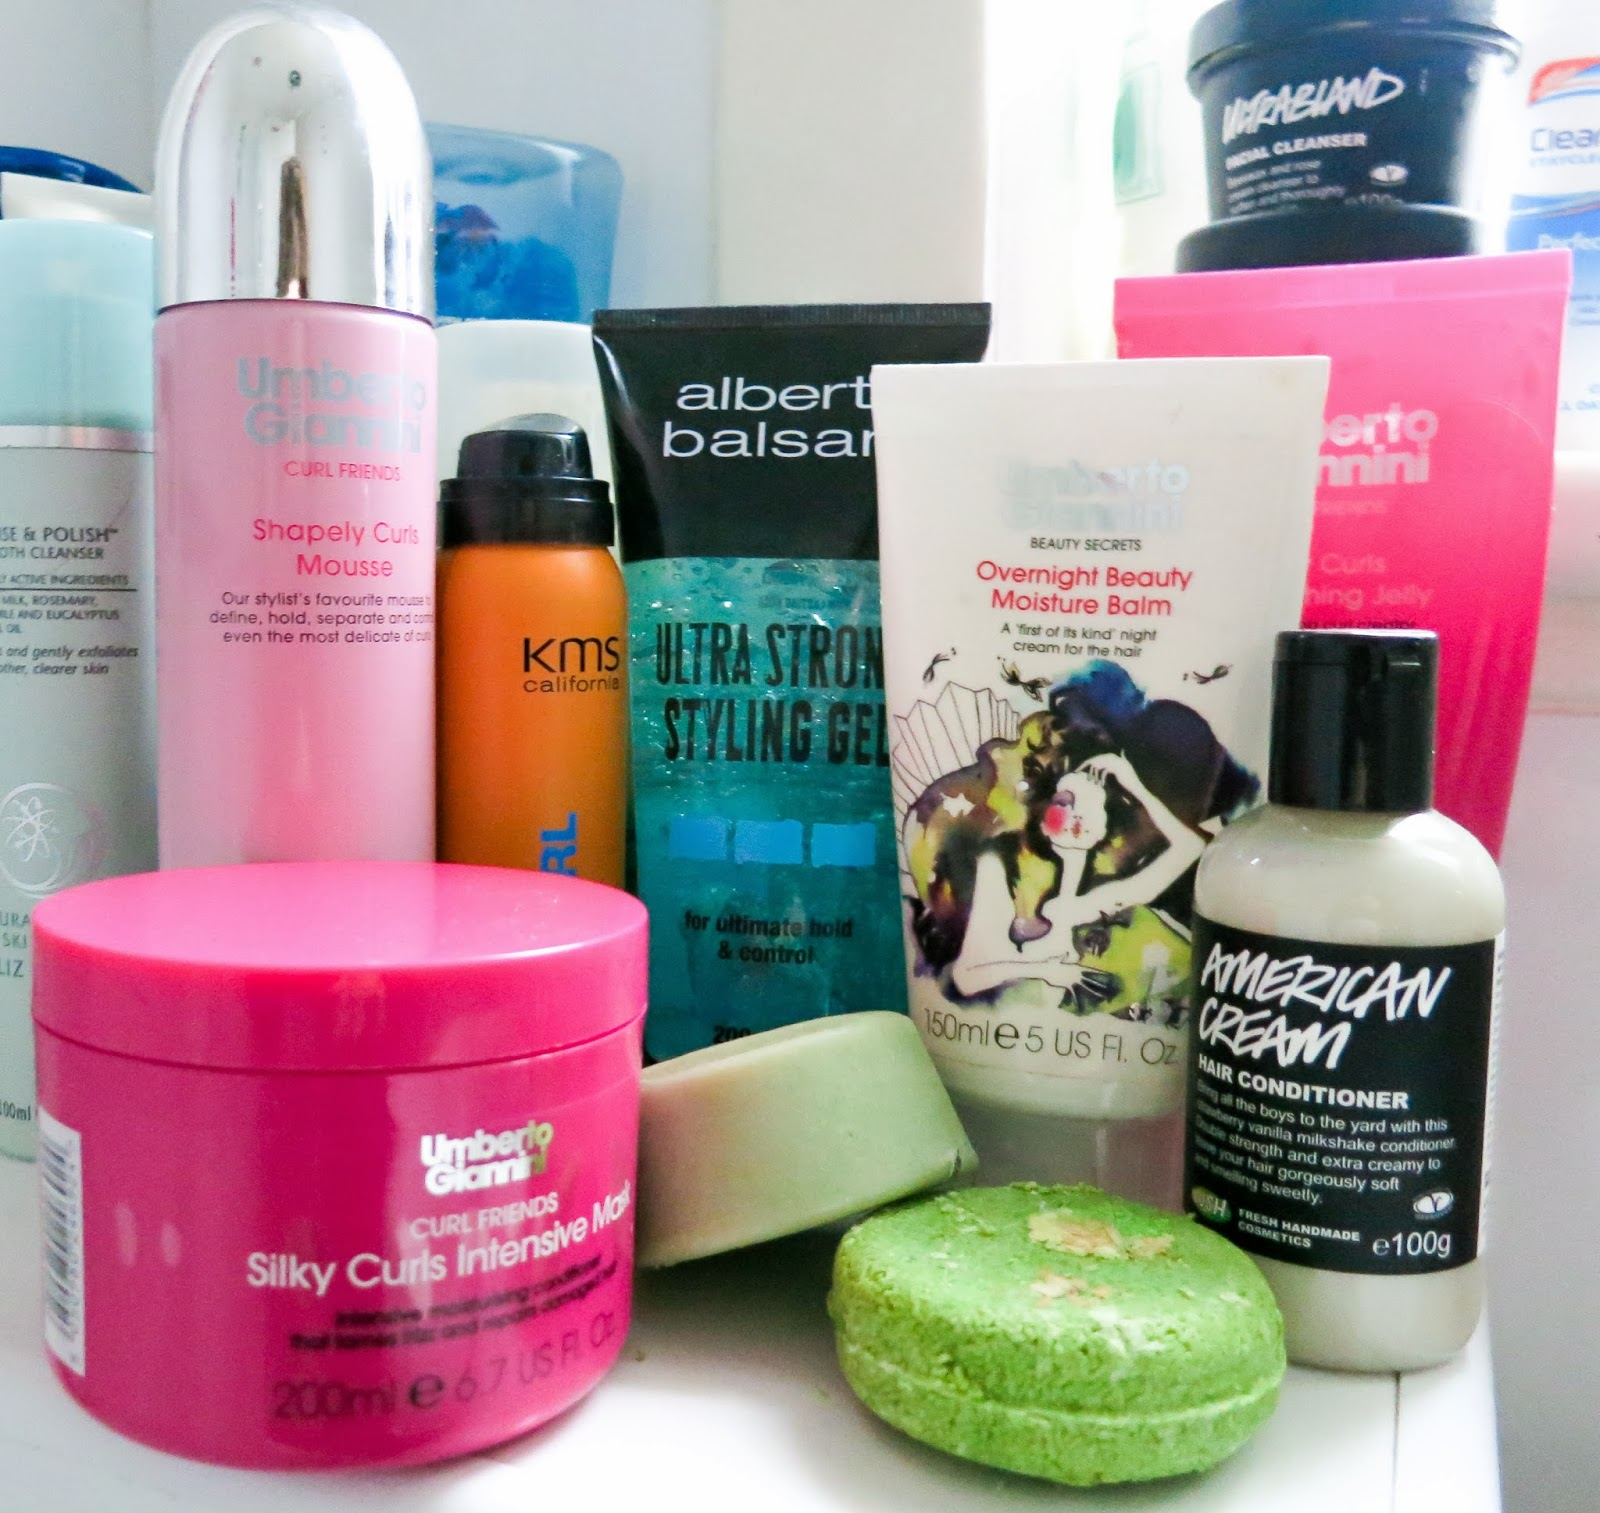 Assortment of hair products on a bathroom shelf